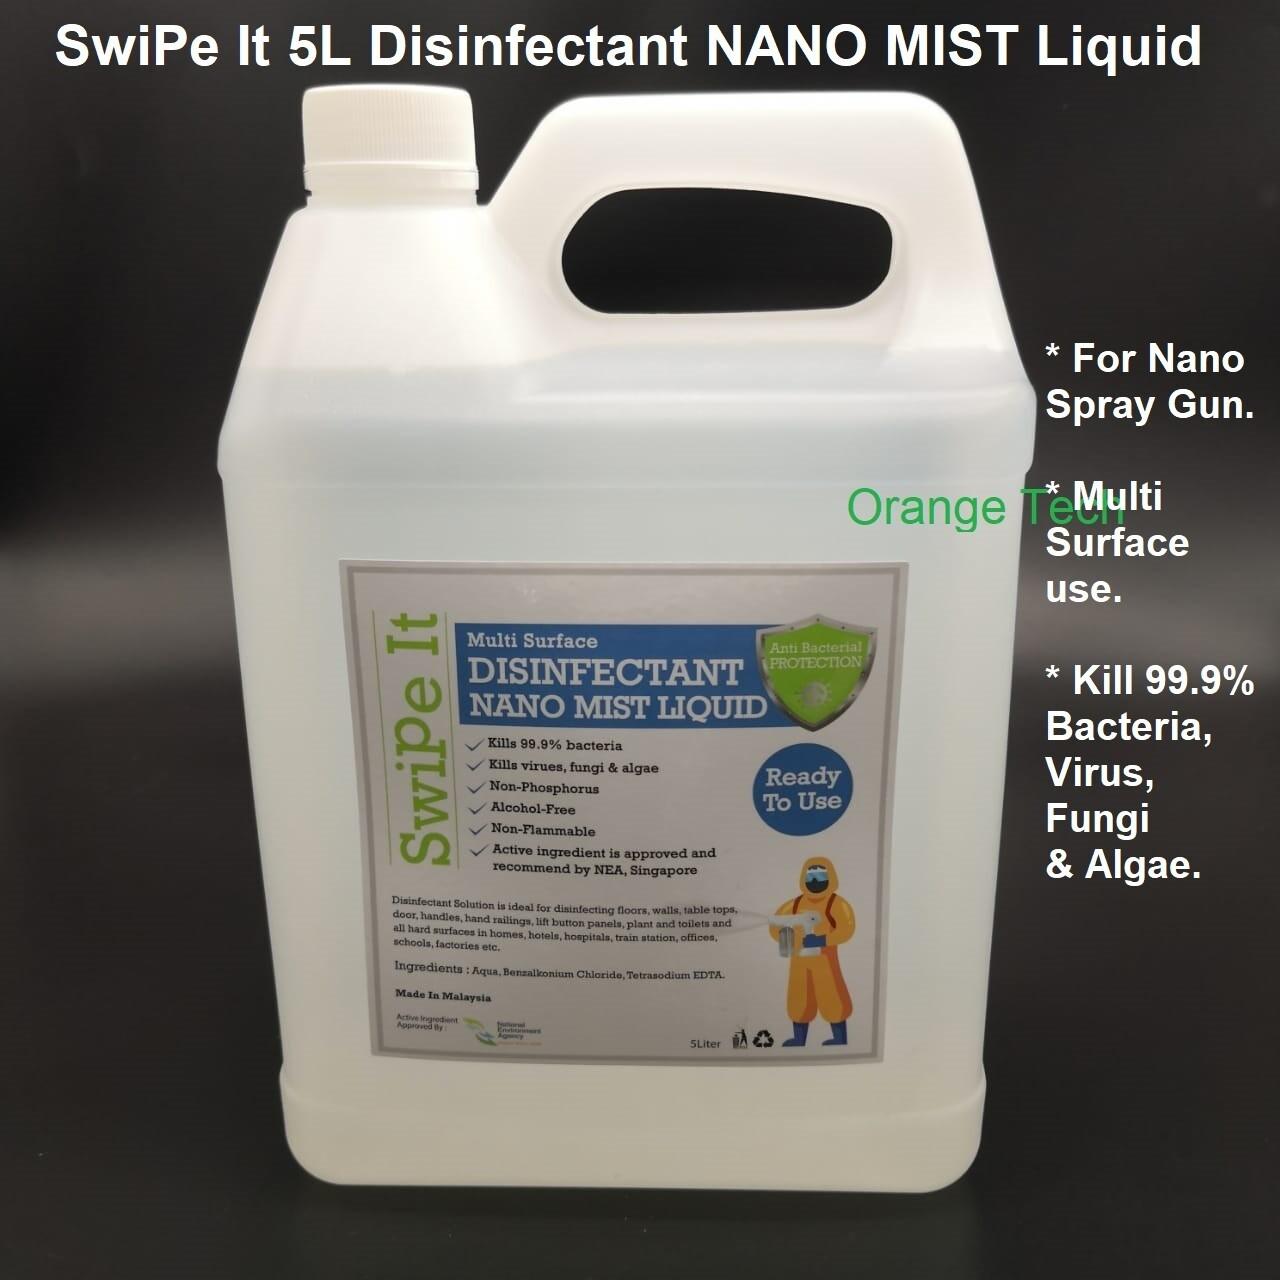 SwiPe It Disinfectant Liquid for Nano Sanitizer Disinfection Spray Gun (5L) Kill 99.9% Bacteria and Viruses